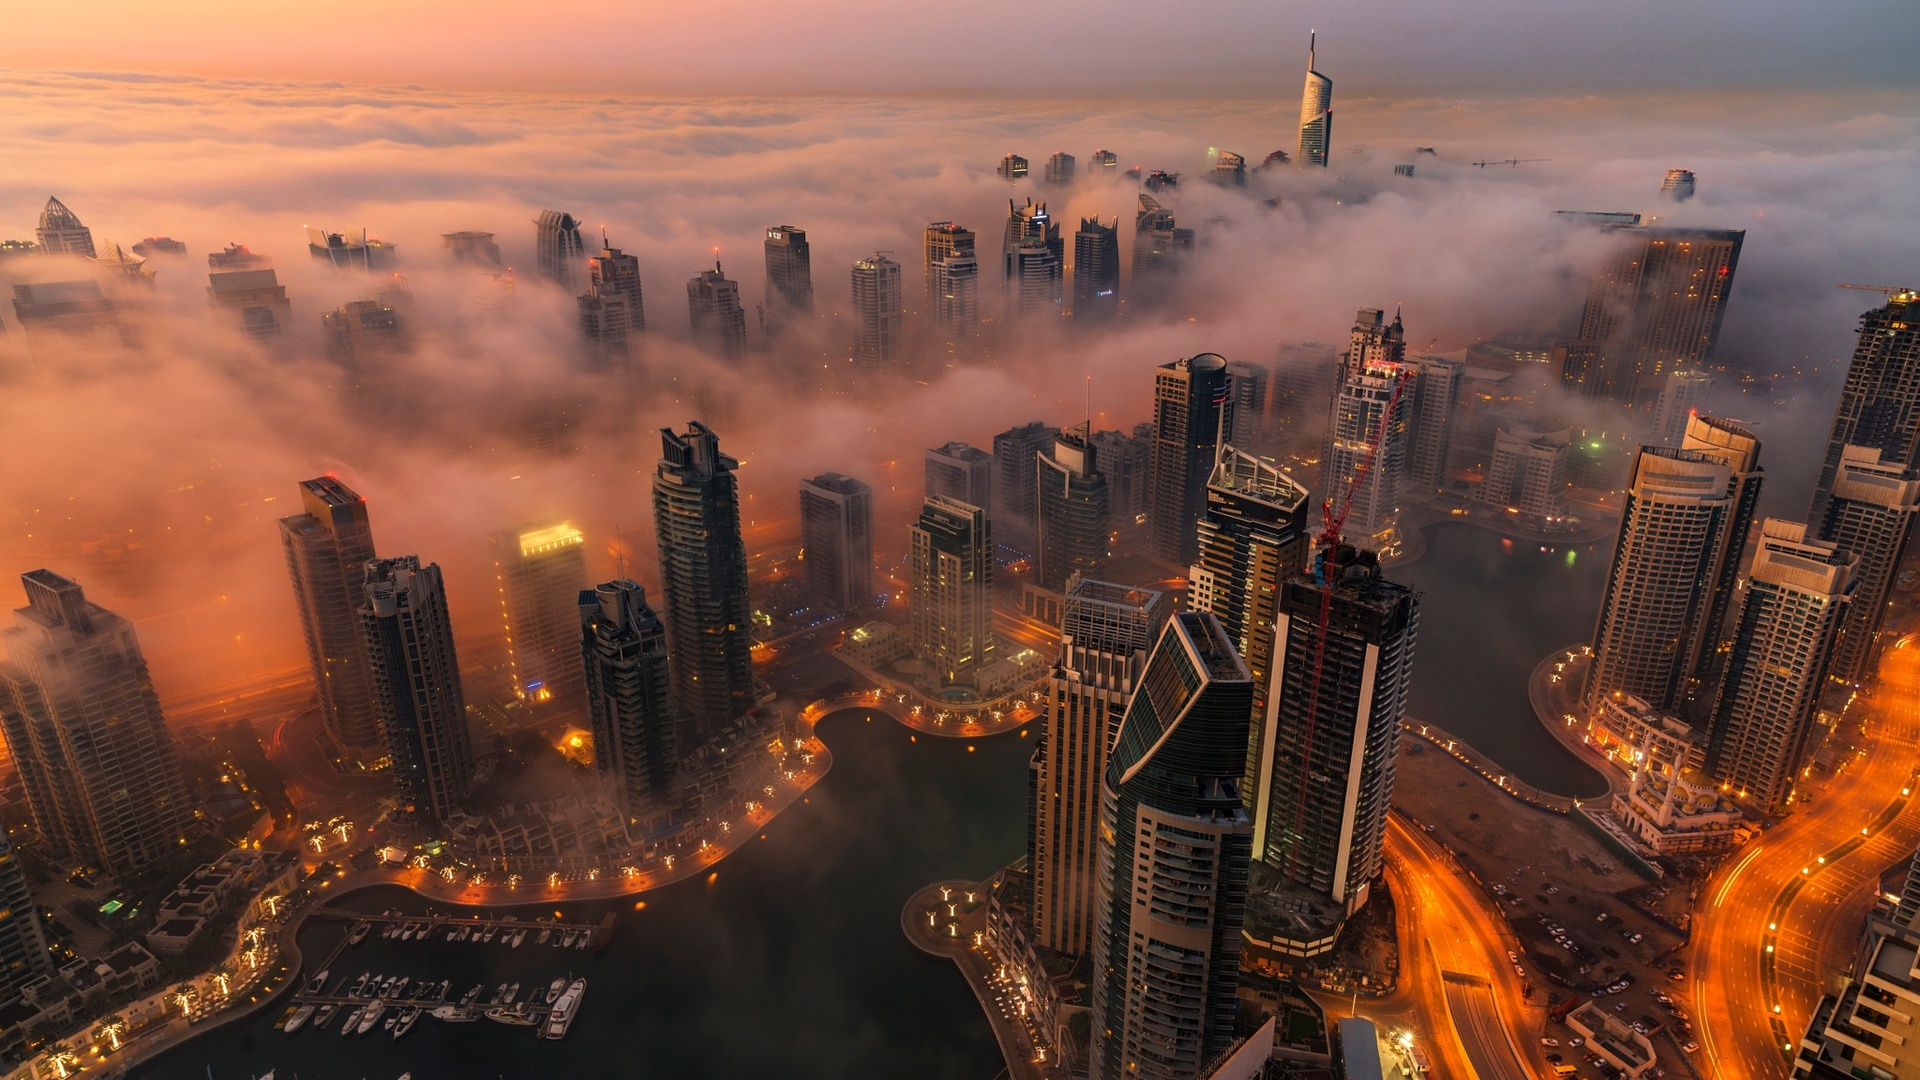 Dubai 4k Wallpaper: 1920x1080 Dubai Laptop Full HD 1080P HD 4k Wallpapers